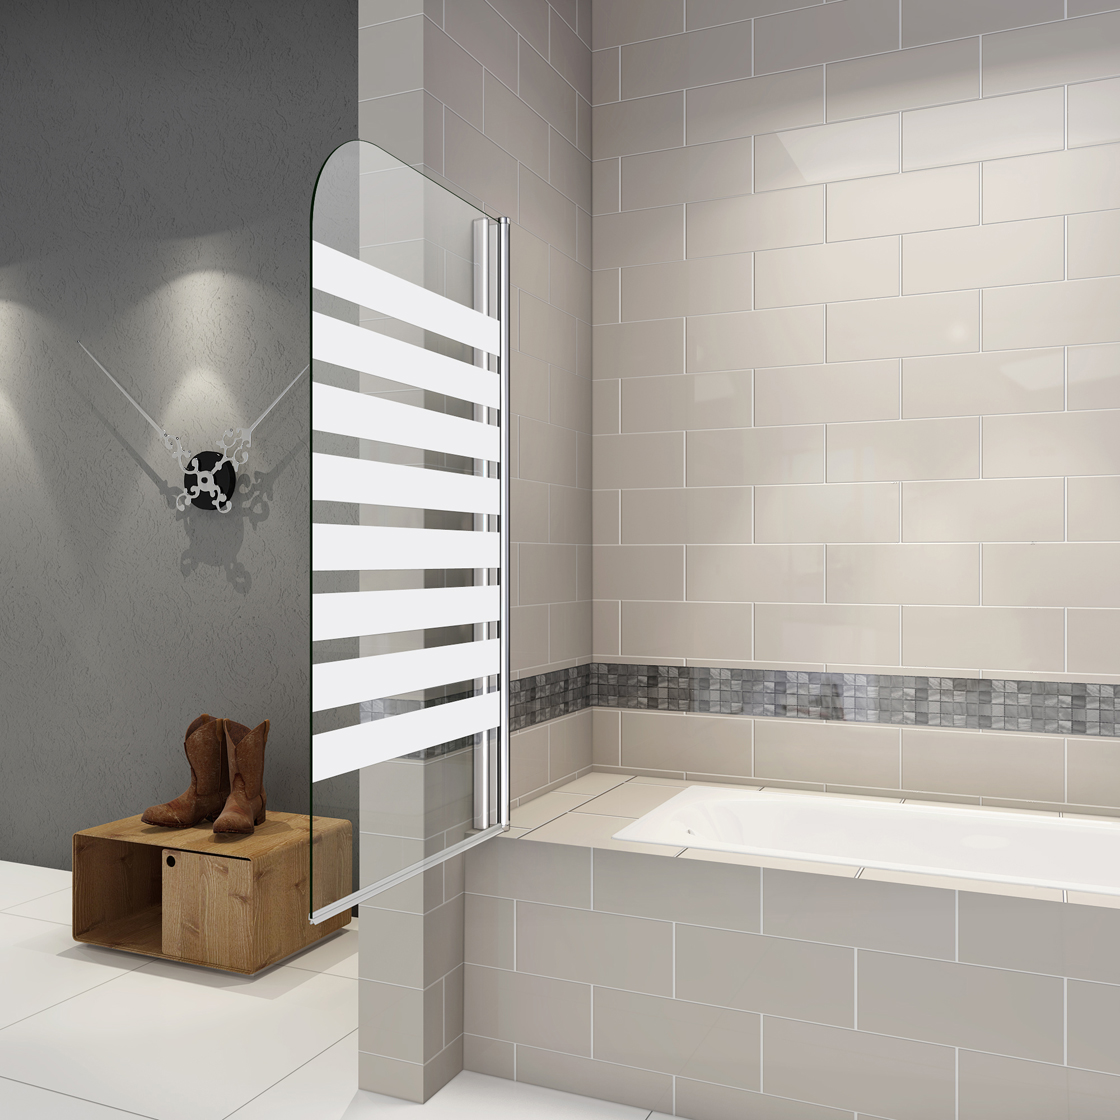 80x140cmbadewannen faltwand duschwand duschabtrennungnano. Black Bedroom Furniture Sets. Home Design Ideas